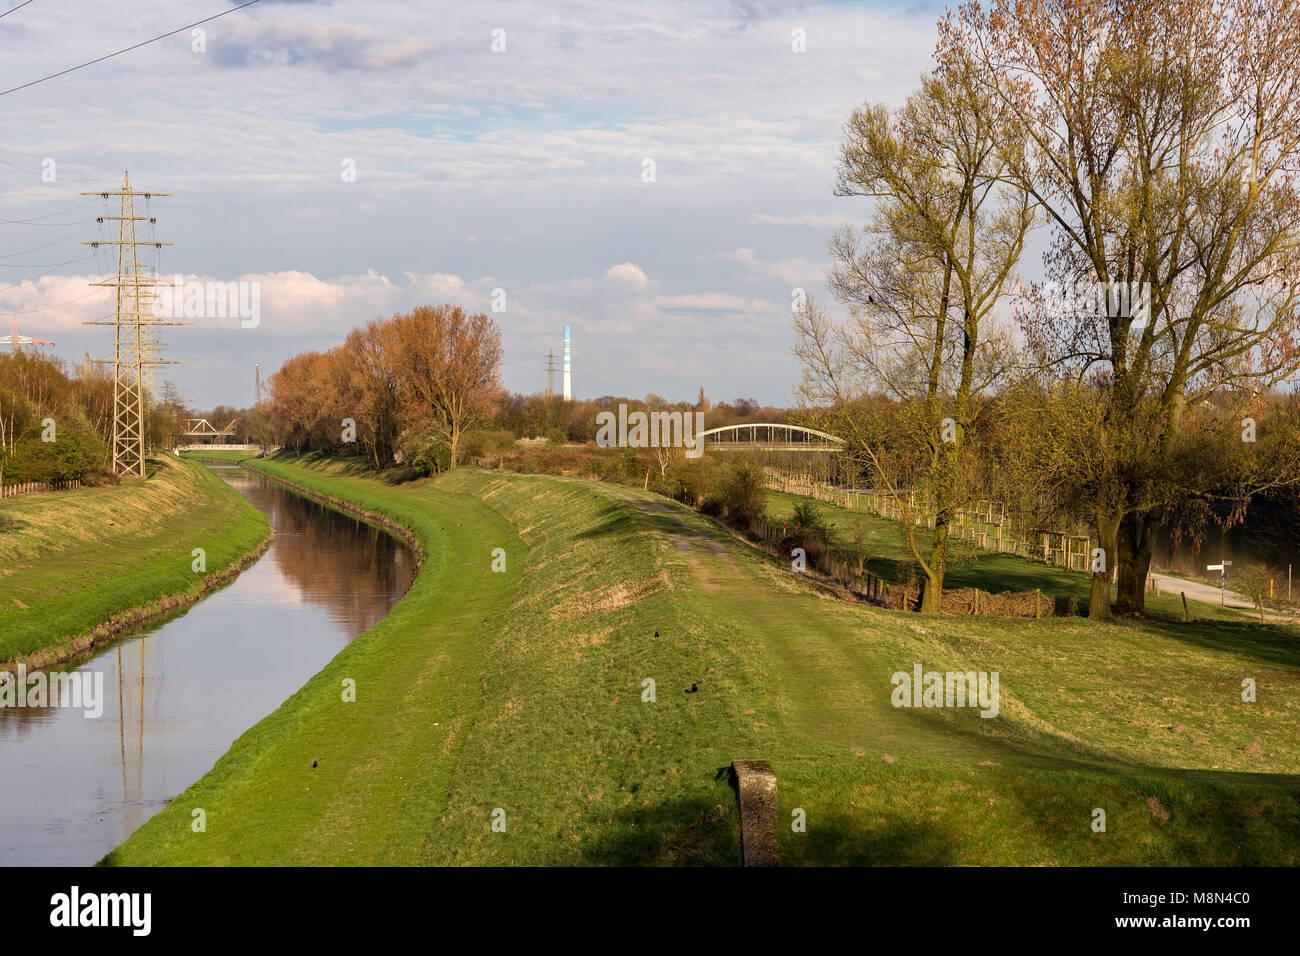 Oberhausen, North Rhine-Westphalia, Germany - April 04, 2016: View over the Brache Vondern with the River Emscher - Stock Image